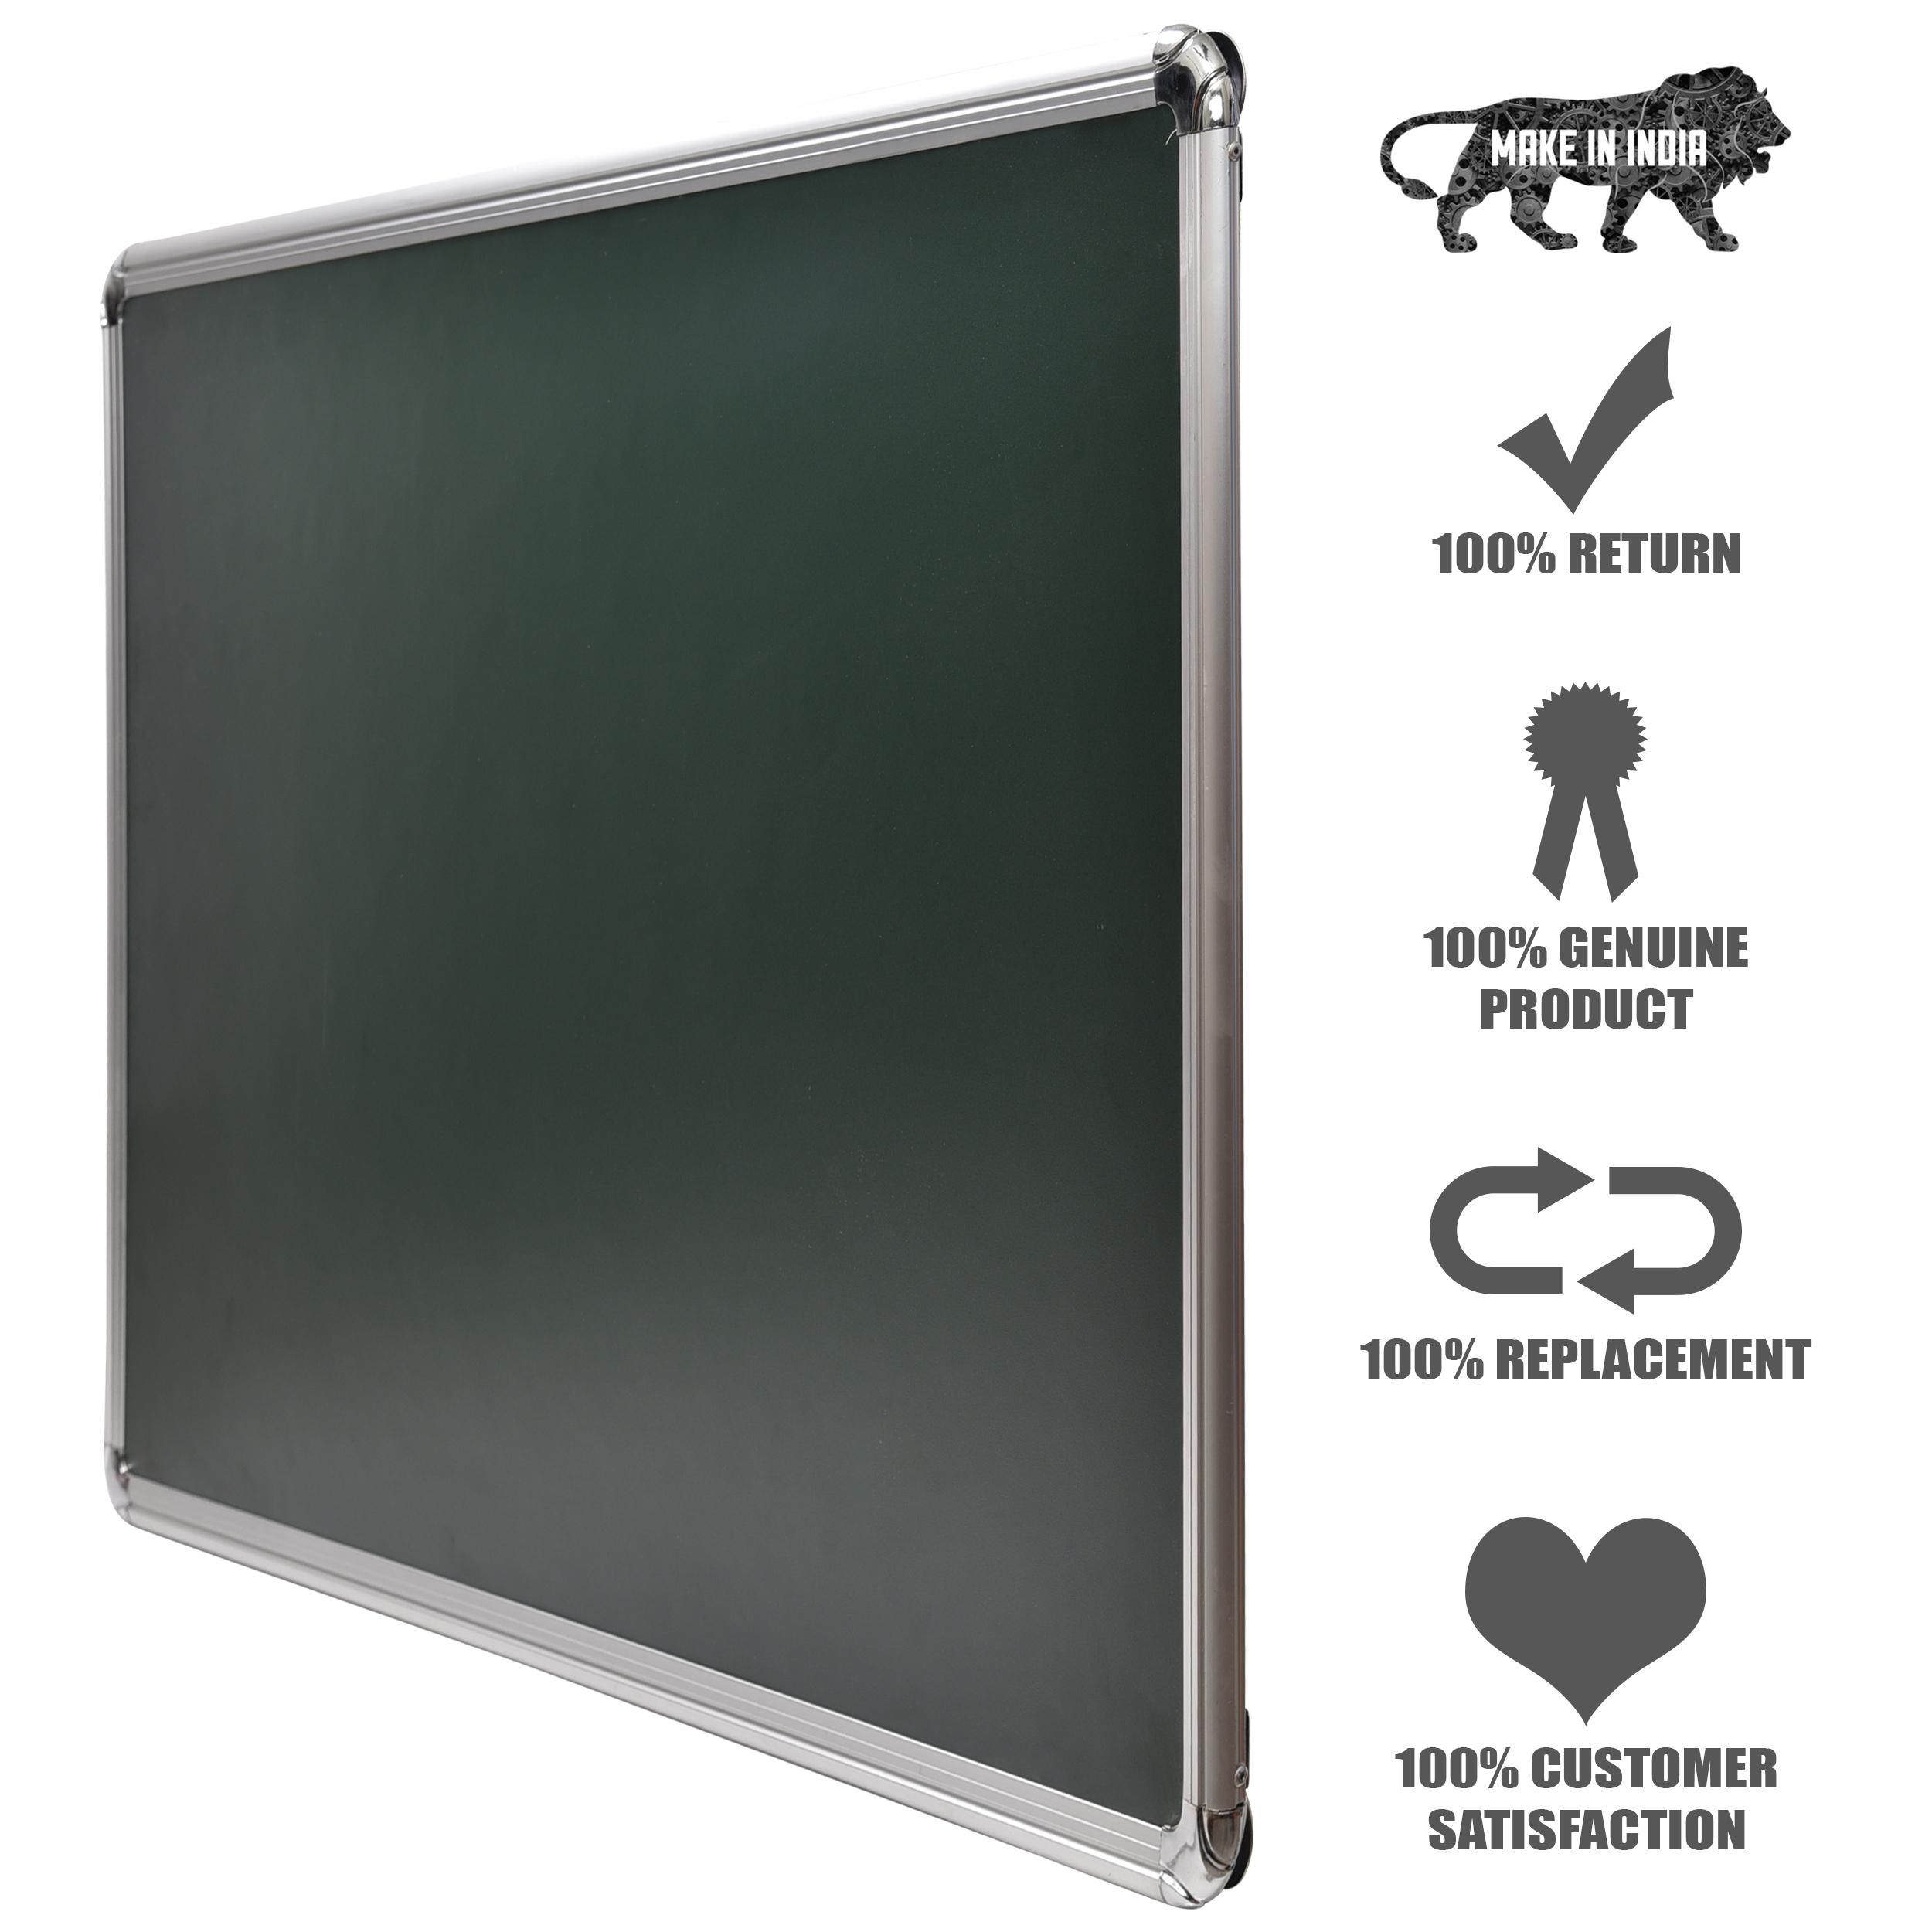 Green Ceramic Board